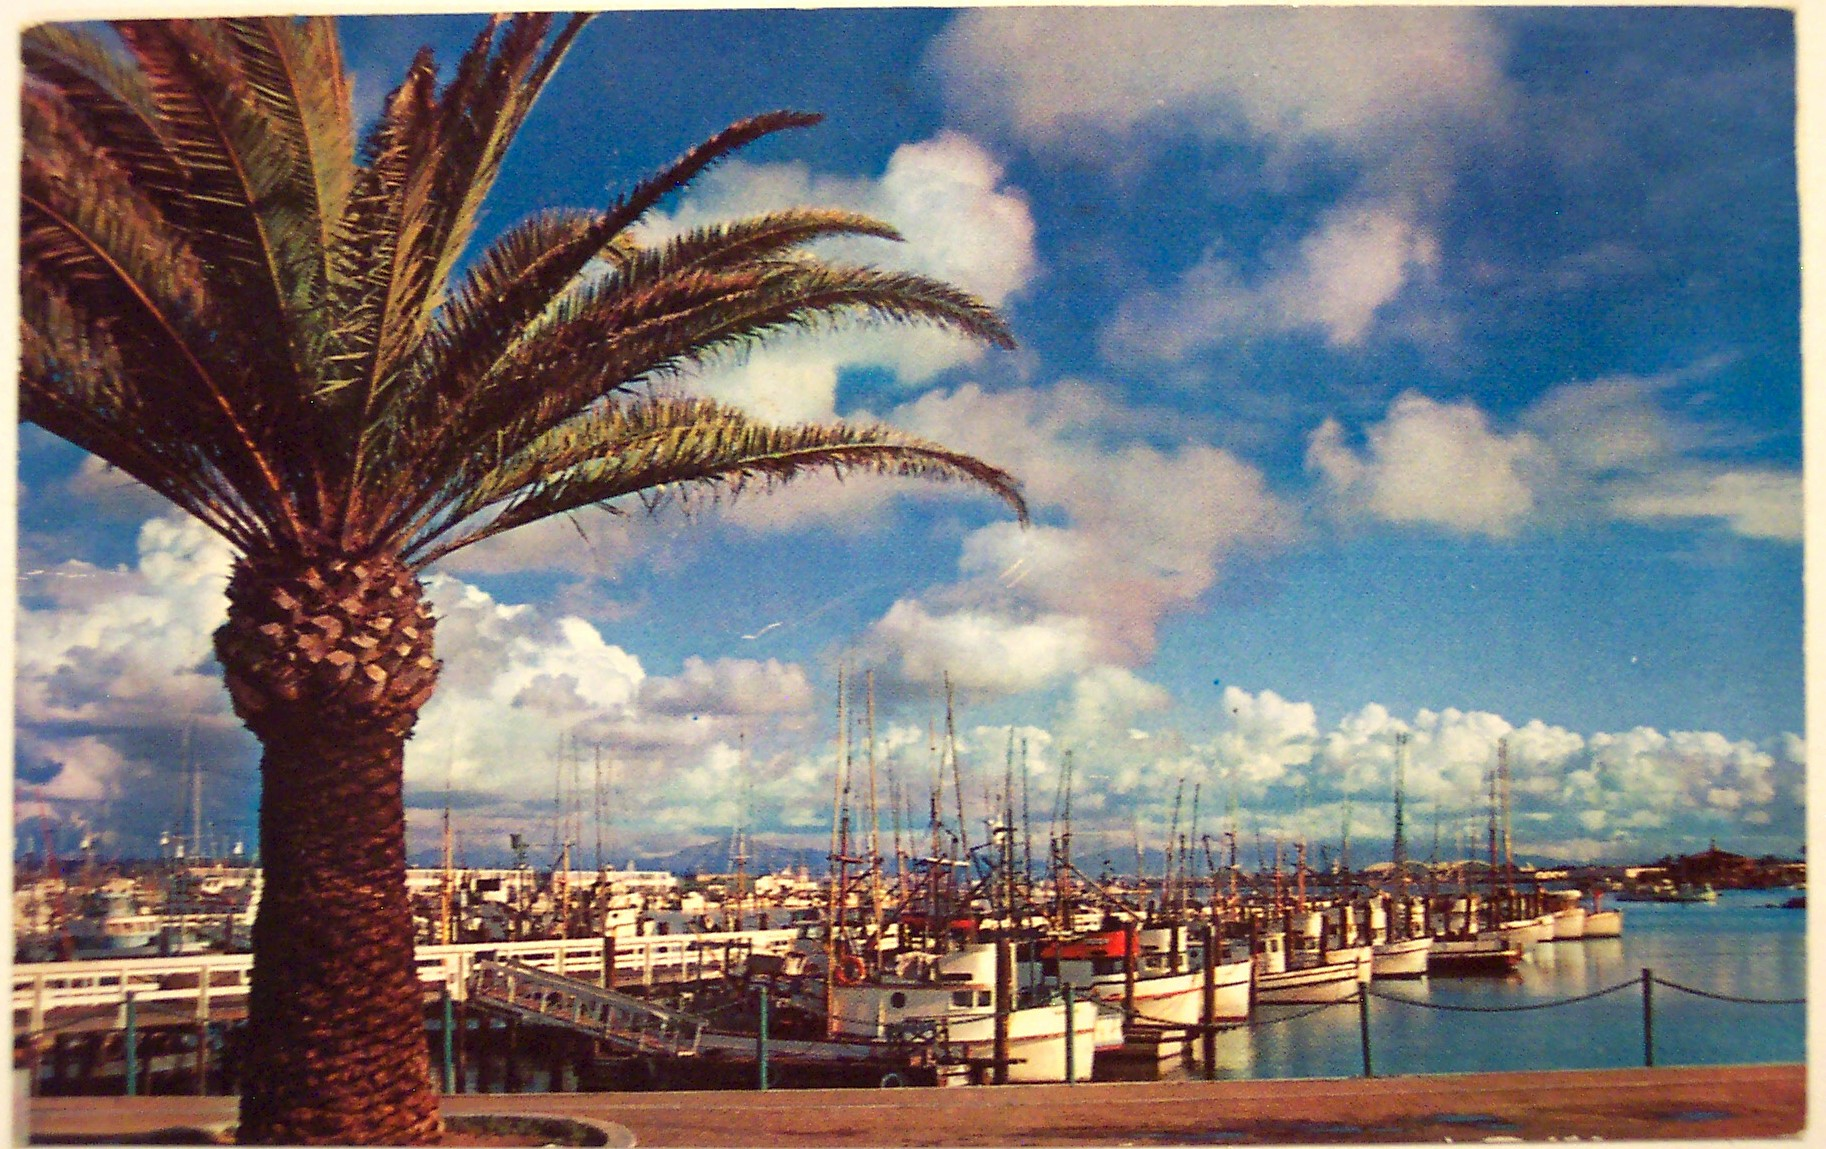 Vintage postcard fishing pier san diego ca flickr for Pier fishing san diego